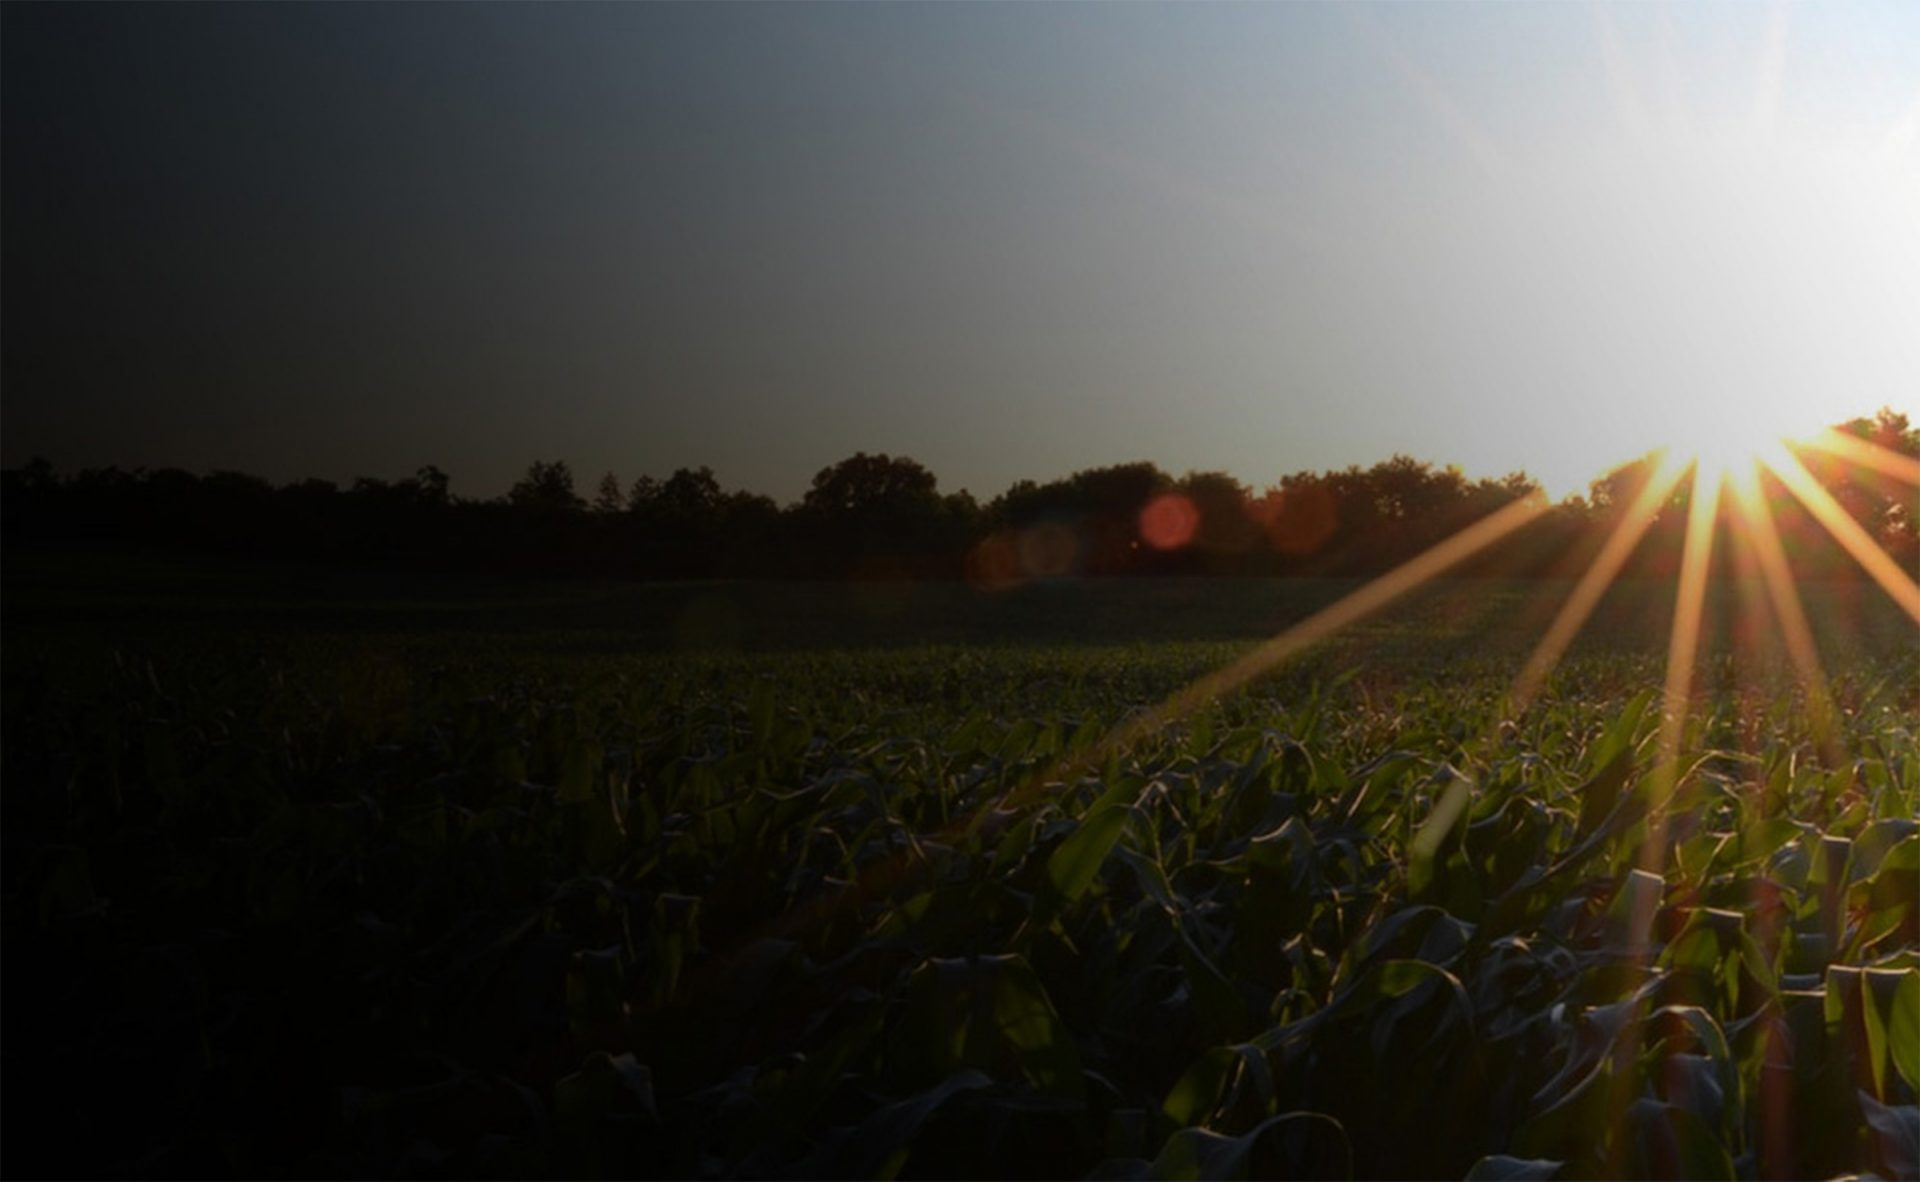 sun setting on a corn field